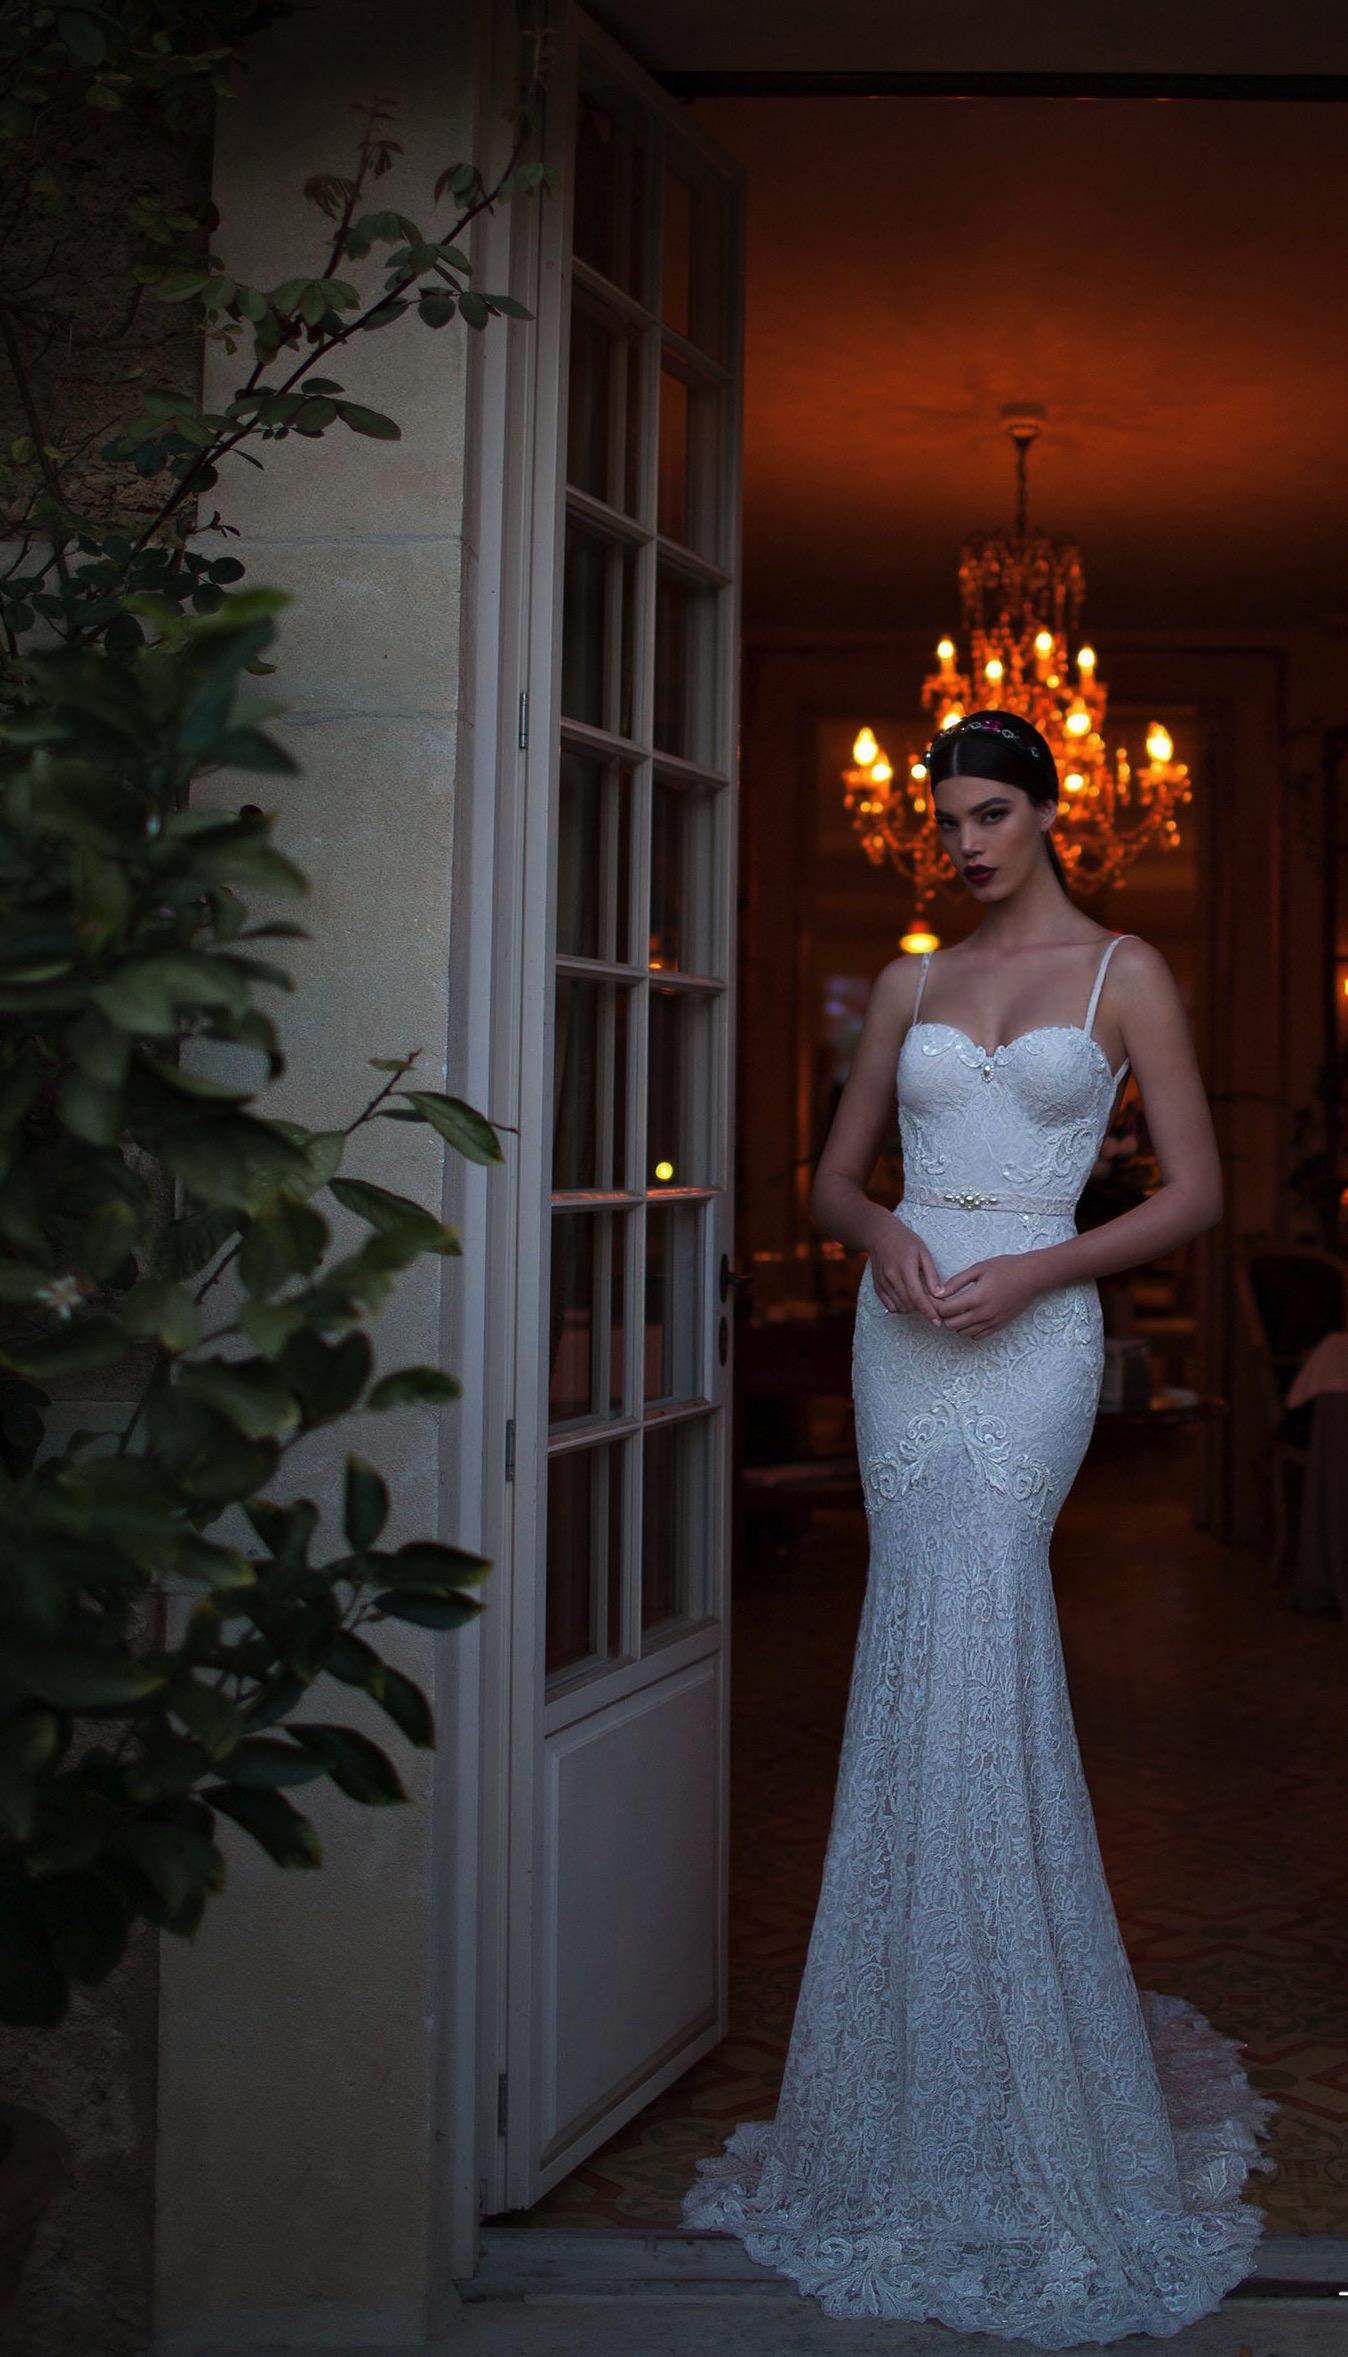 Fullsize Of Art Deco Wedding Dress